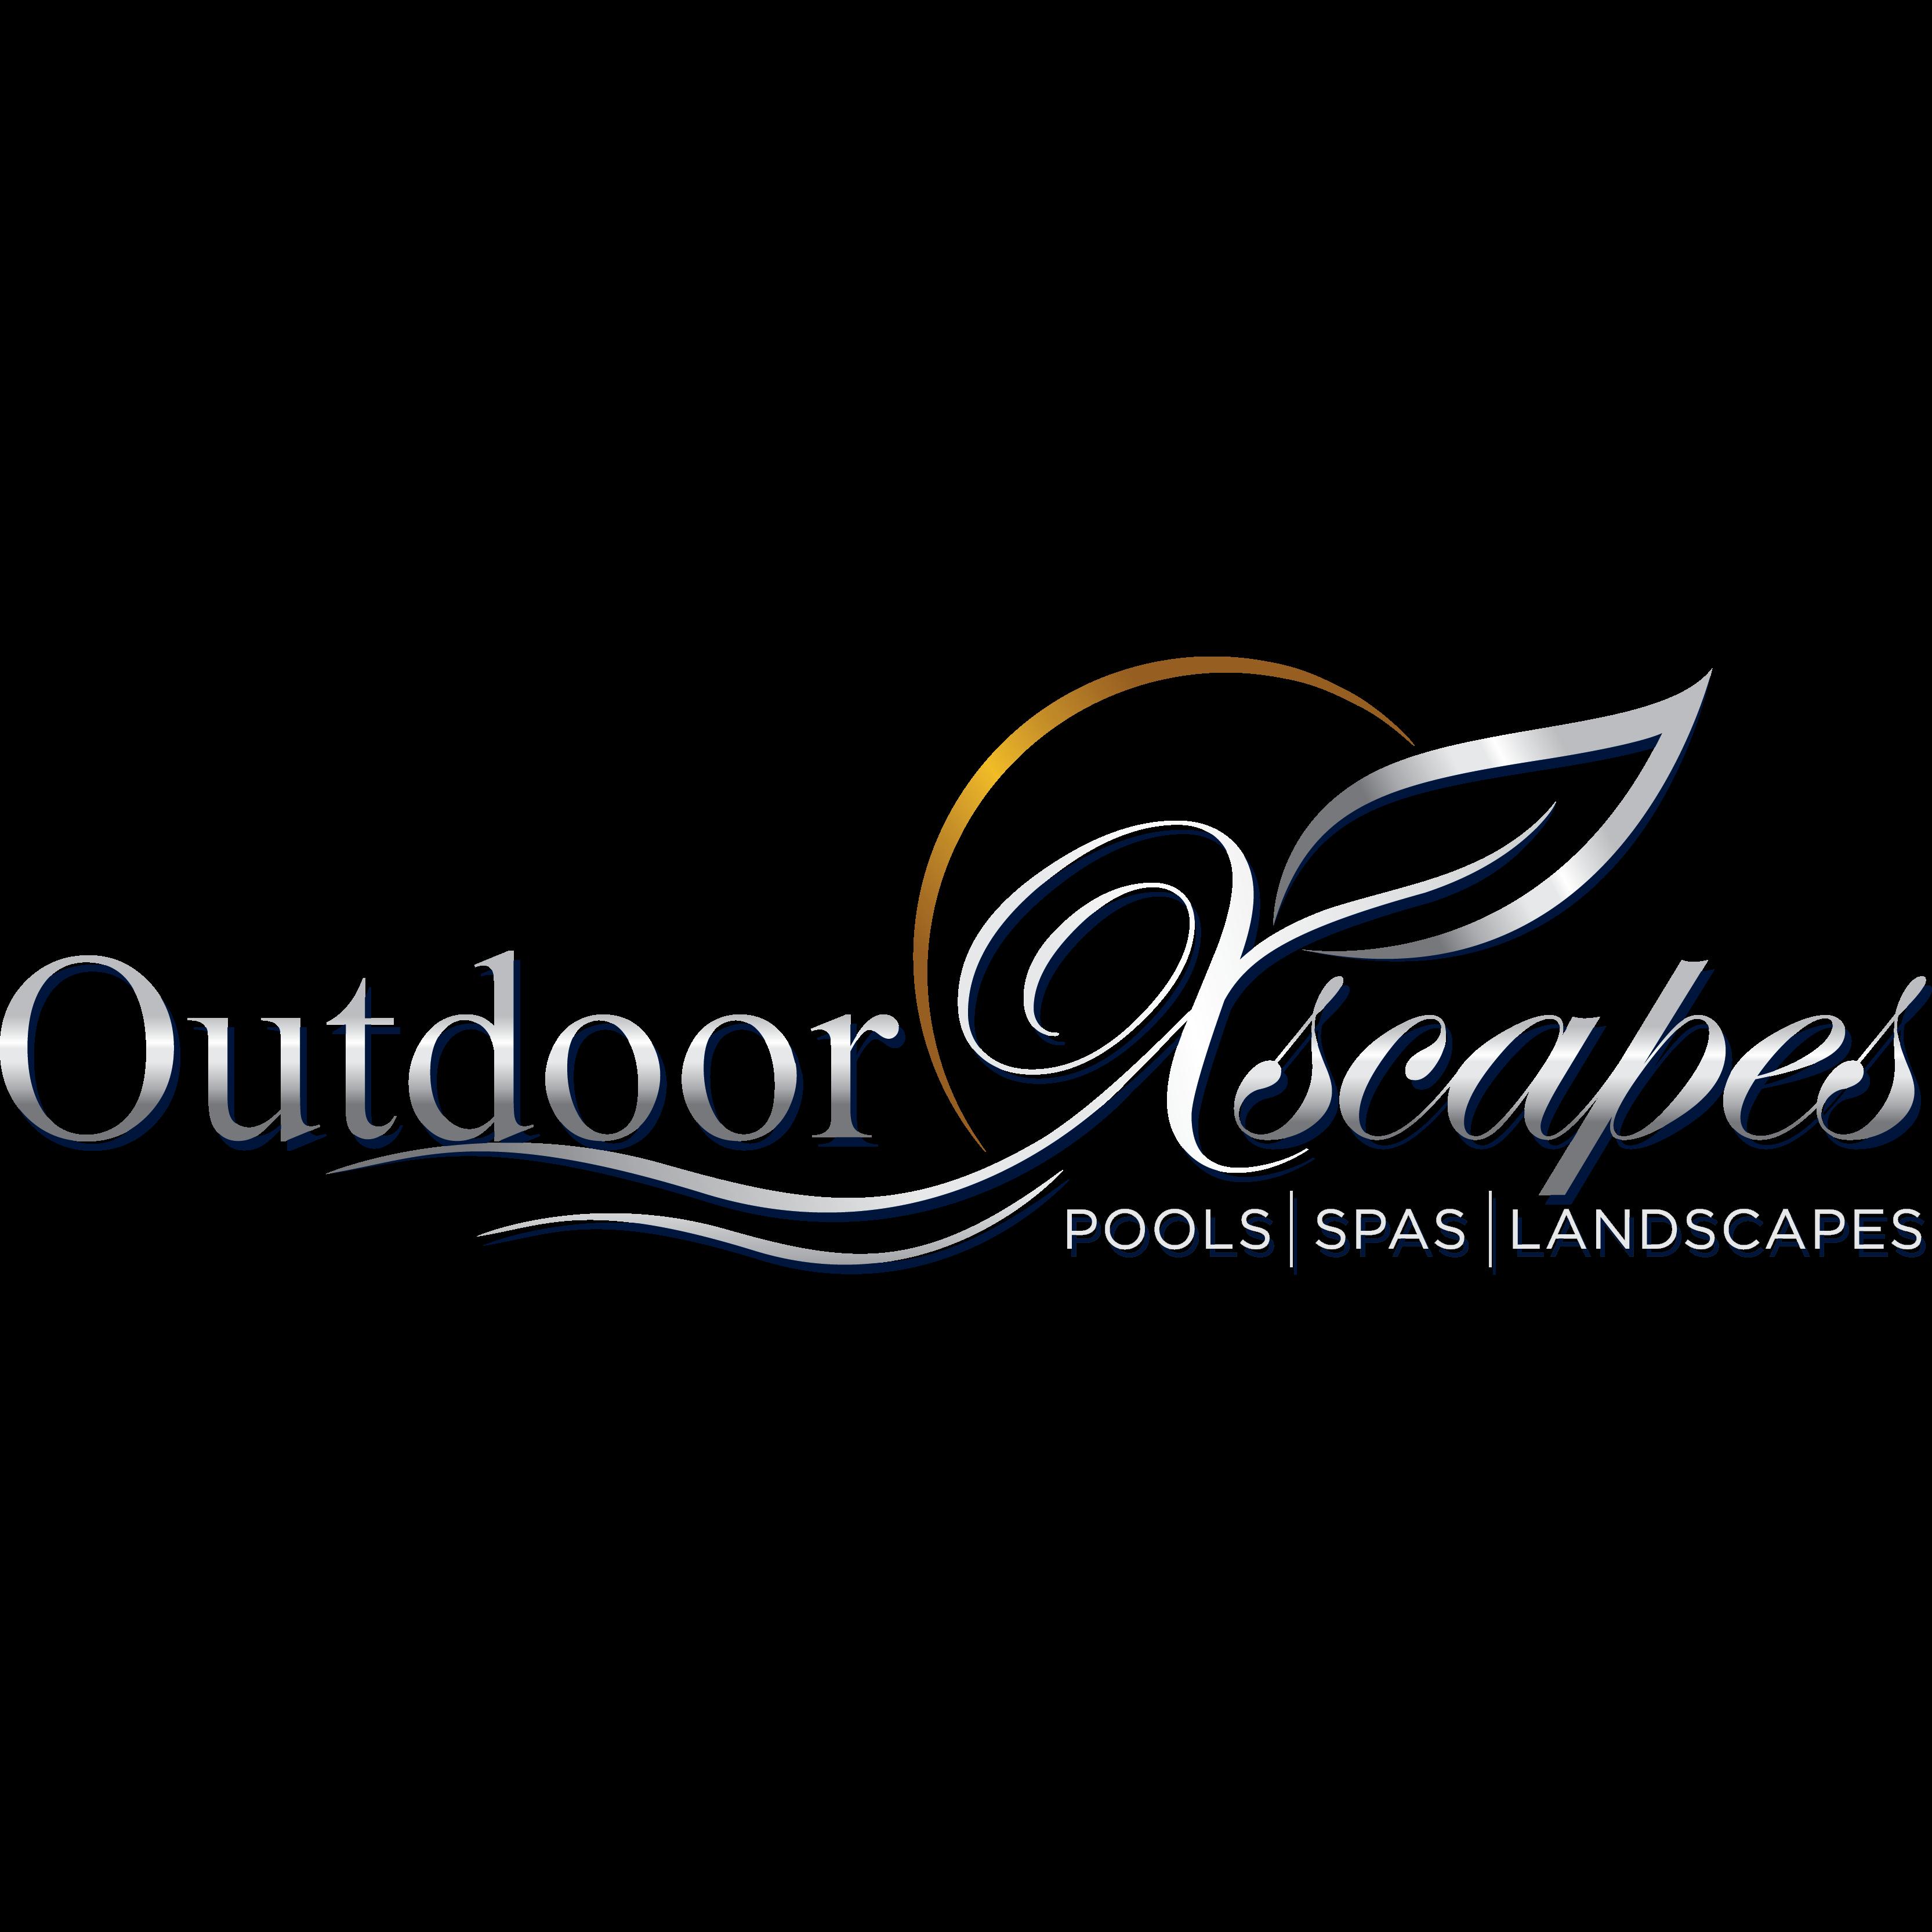 Outdoor Xscapes, LLC